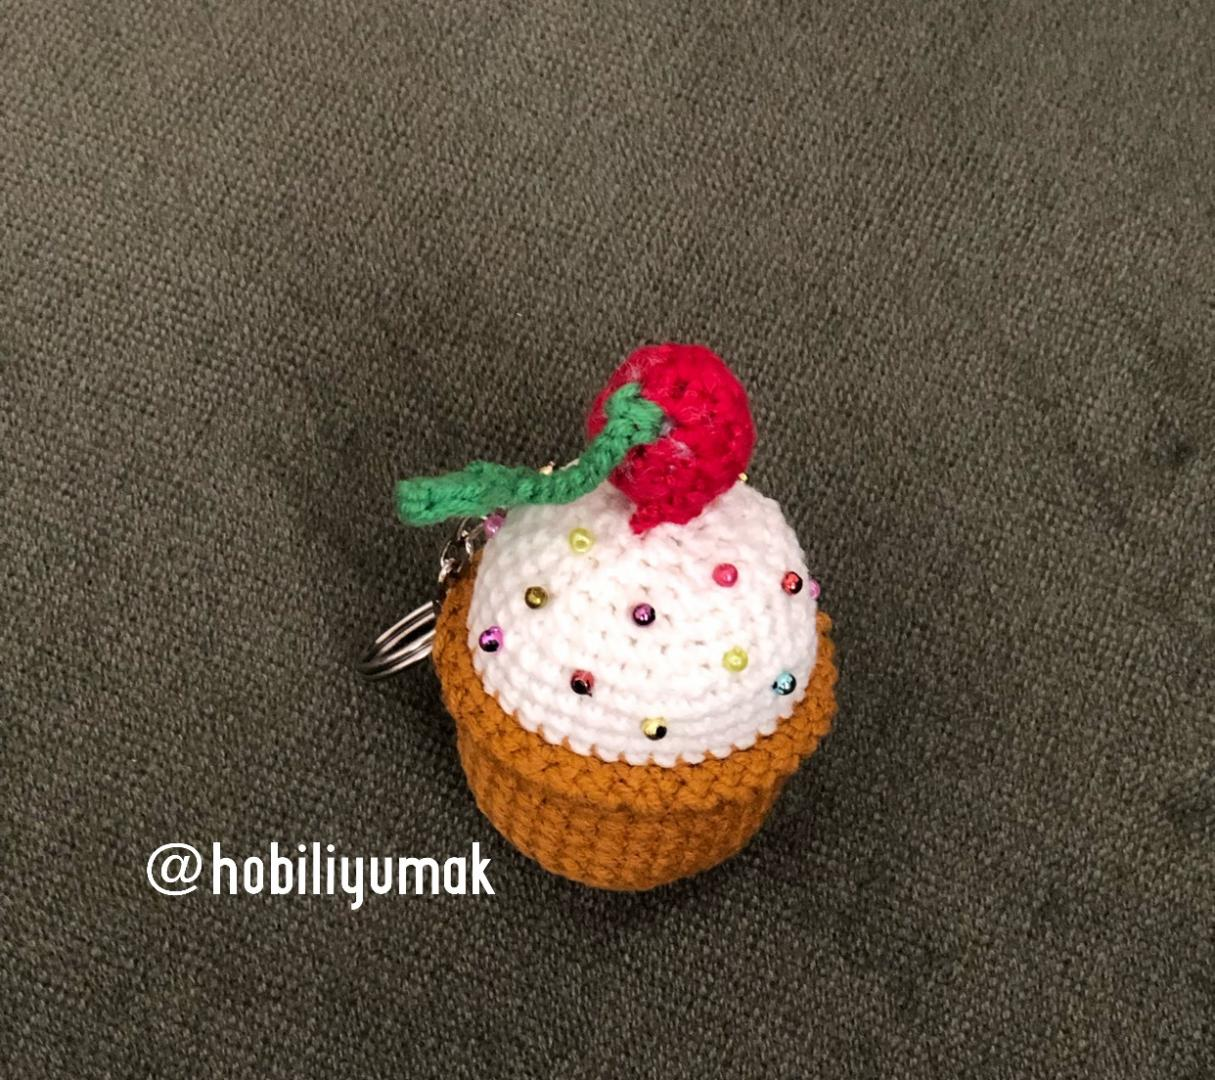 amigurumi-cupcake-anahtarlik-yapimi-1